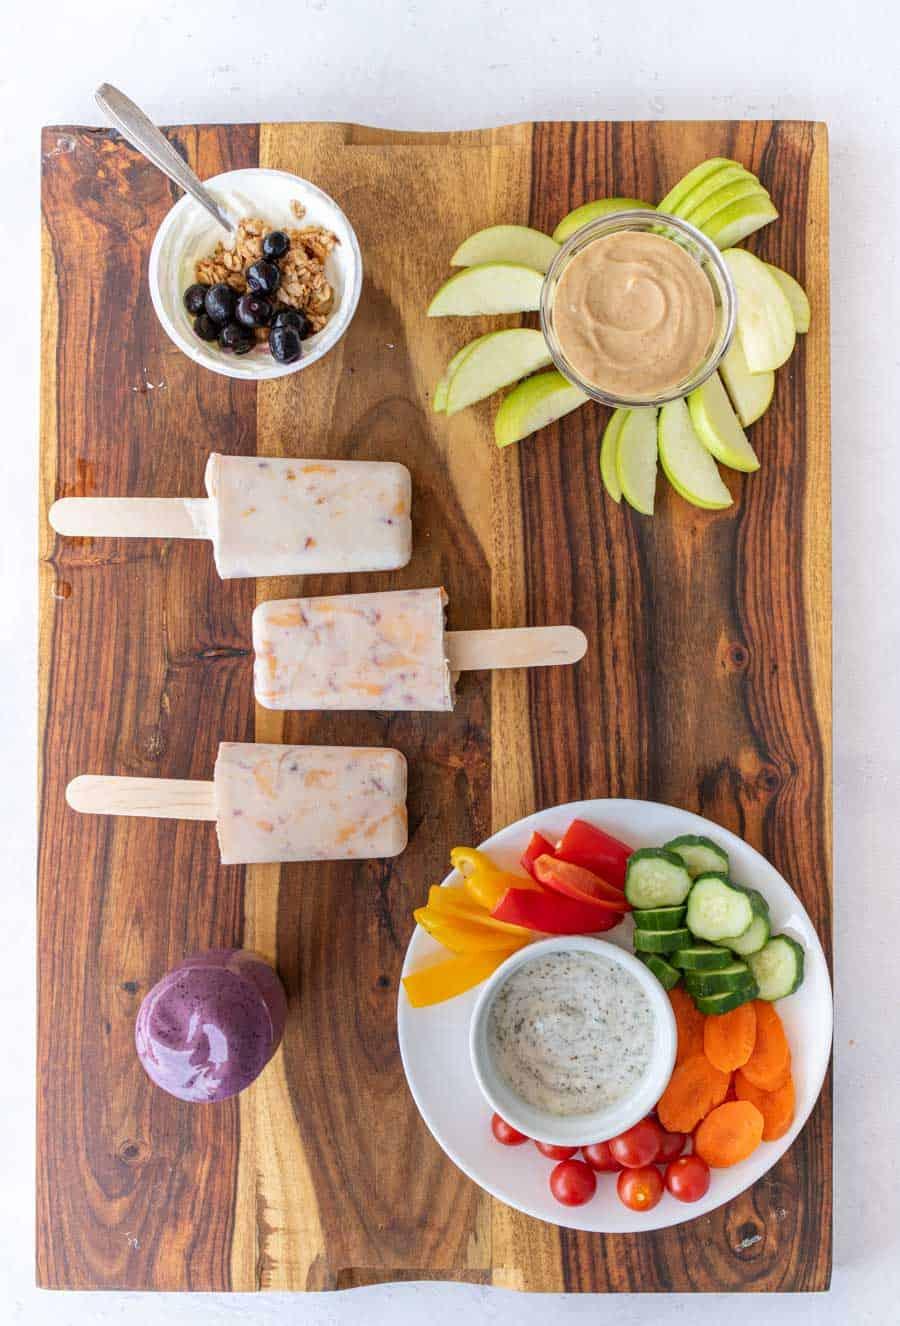 healthy snacks on a wood board